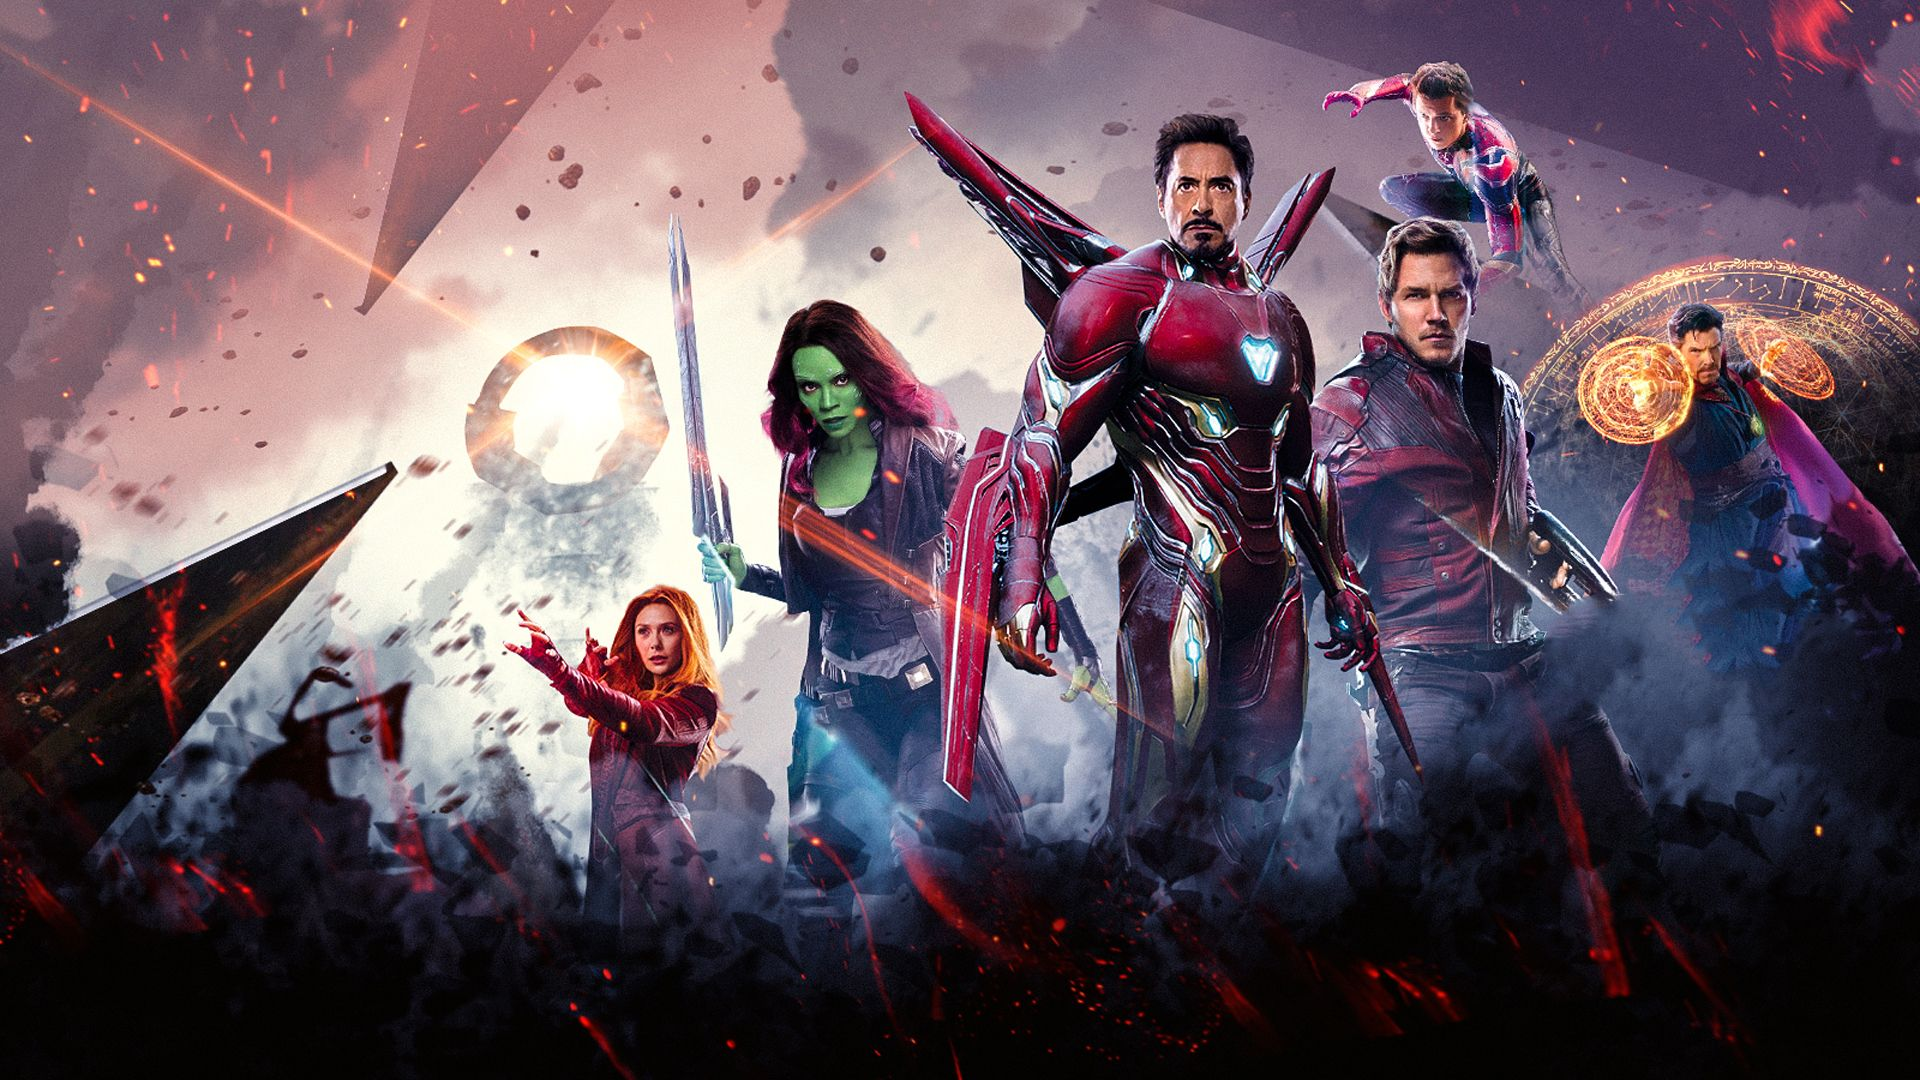 Avengers Superheroes Avengers Infinity War Avengers Pictures Avengers